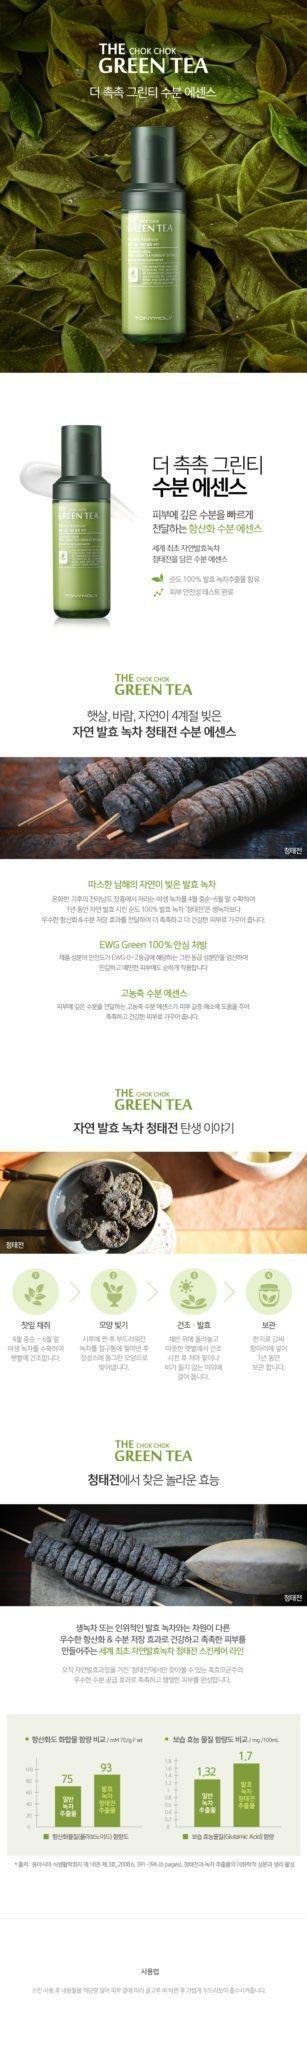 TONYMOLY The Chok Chok Green Tea Watery Essence 55ml malaysia singapore indonesia